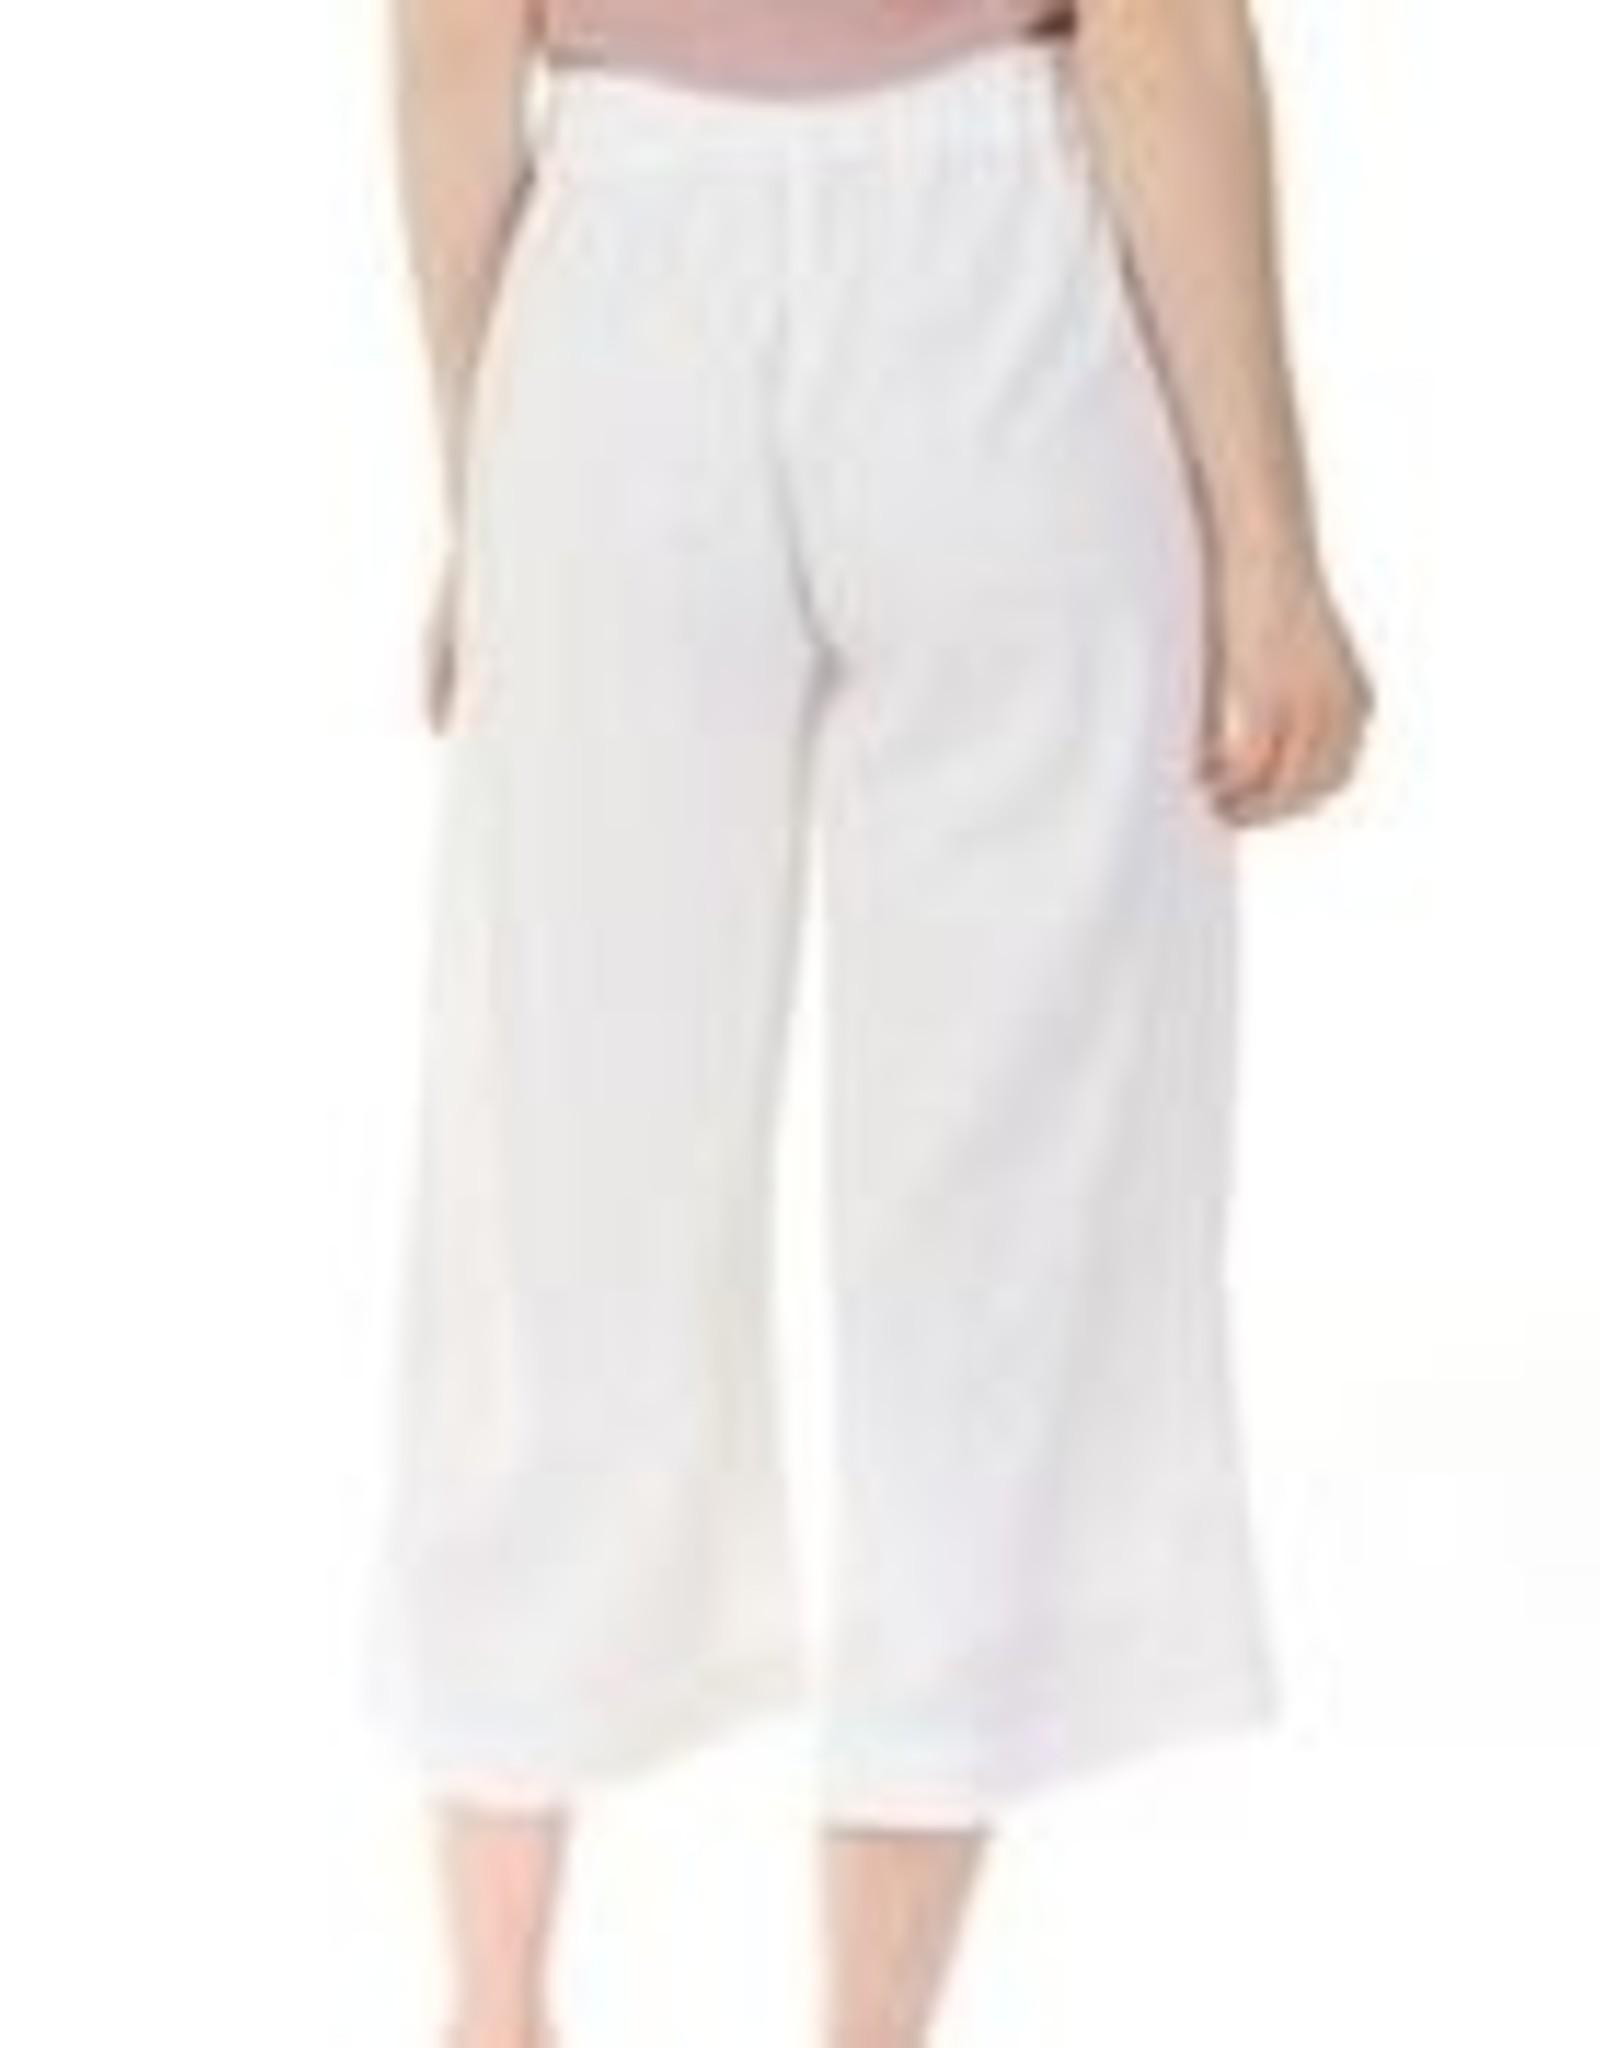 Charlie B White Linen Blend Palazzo Wide Leg Pant